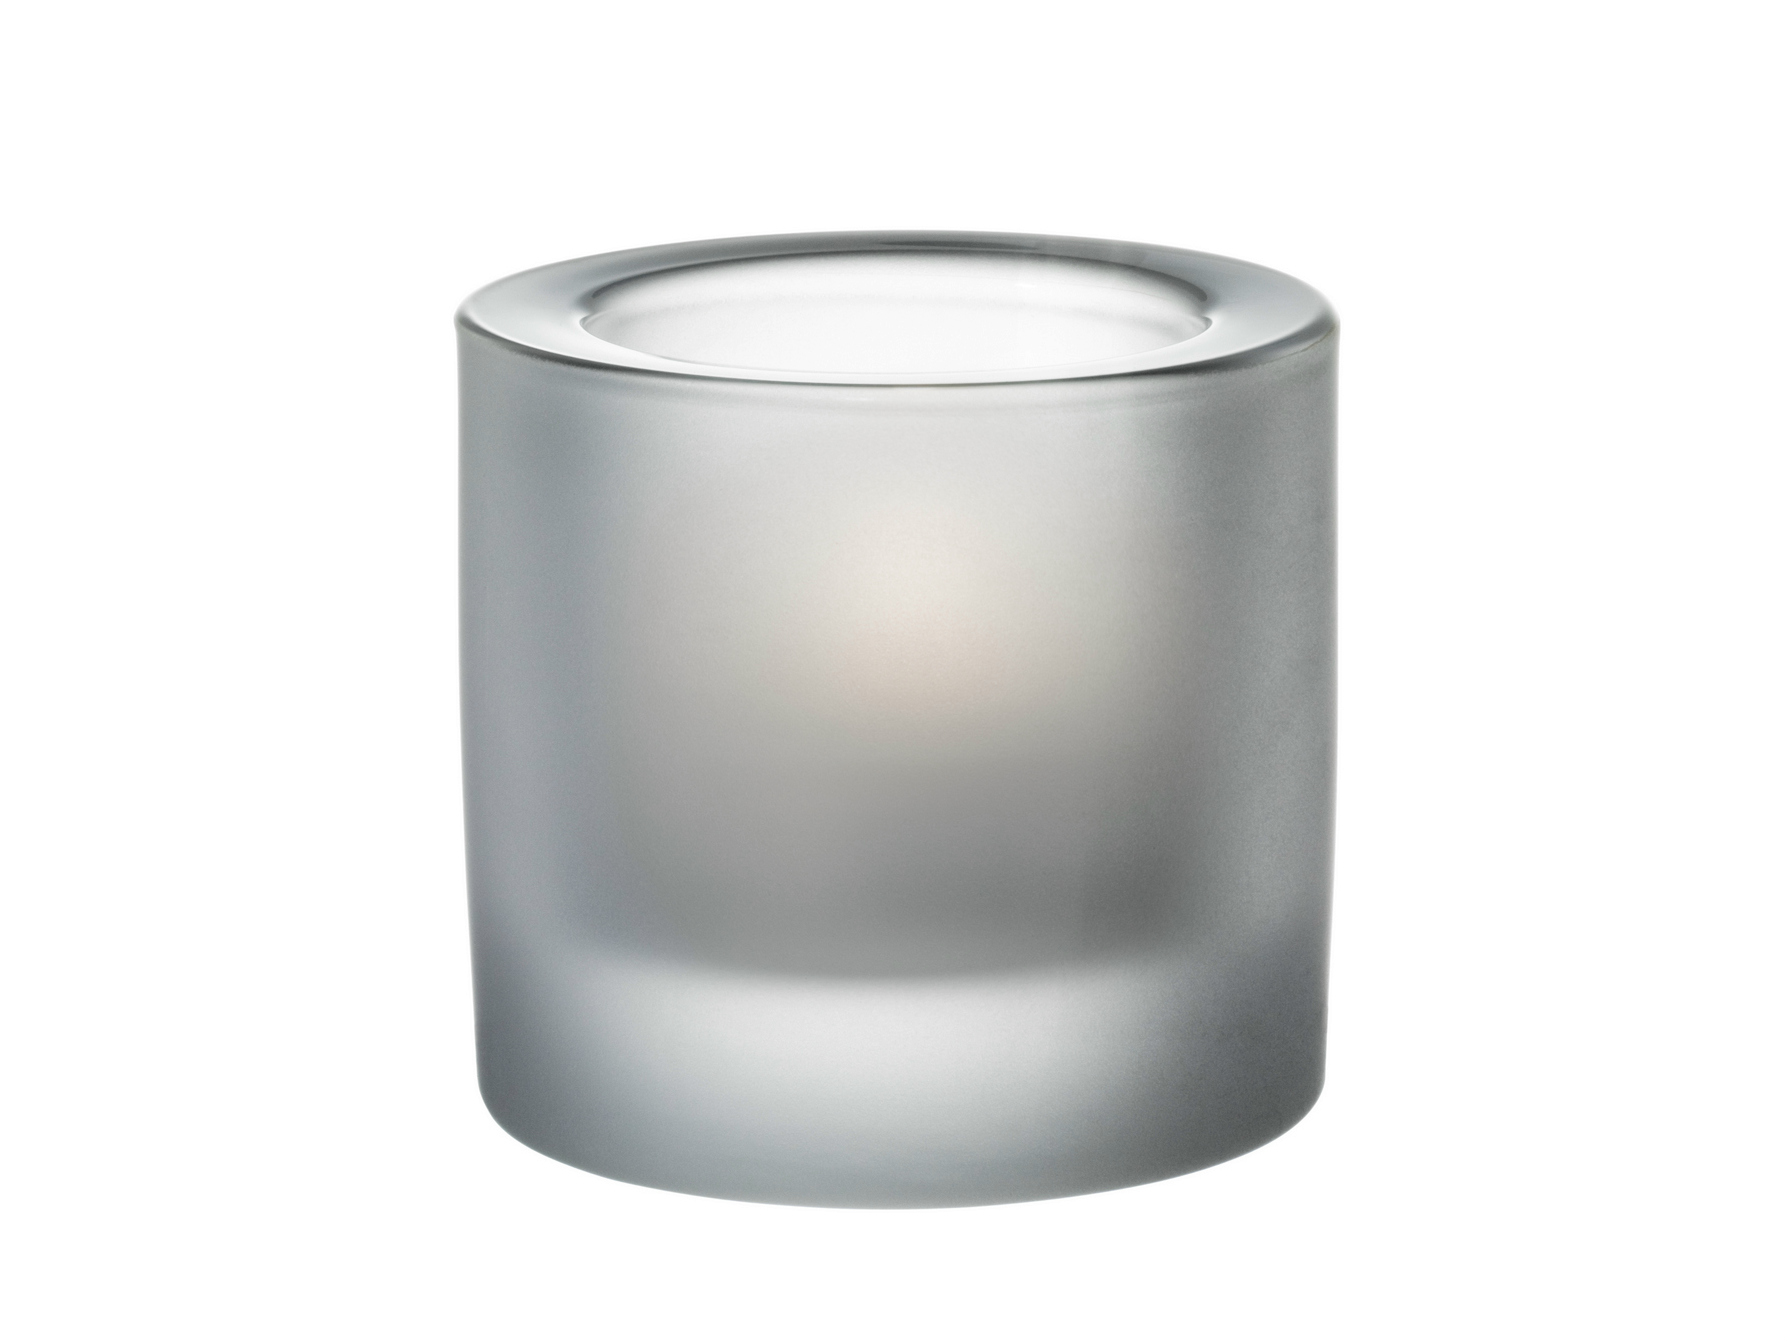 KIVI Portacandele in vetro satinato by iittala design Heikki Orvola